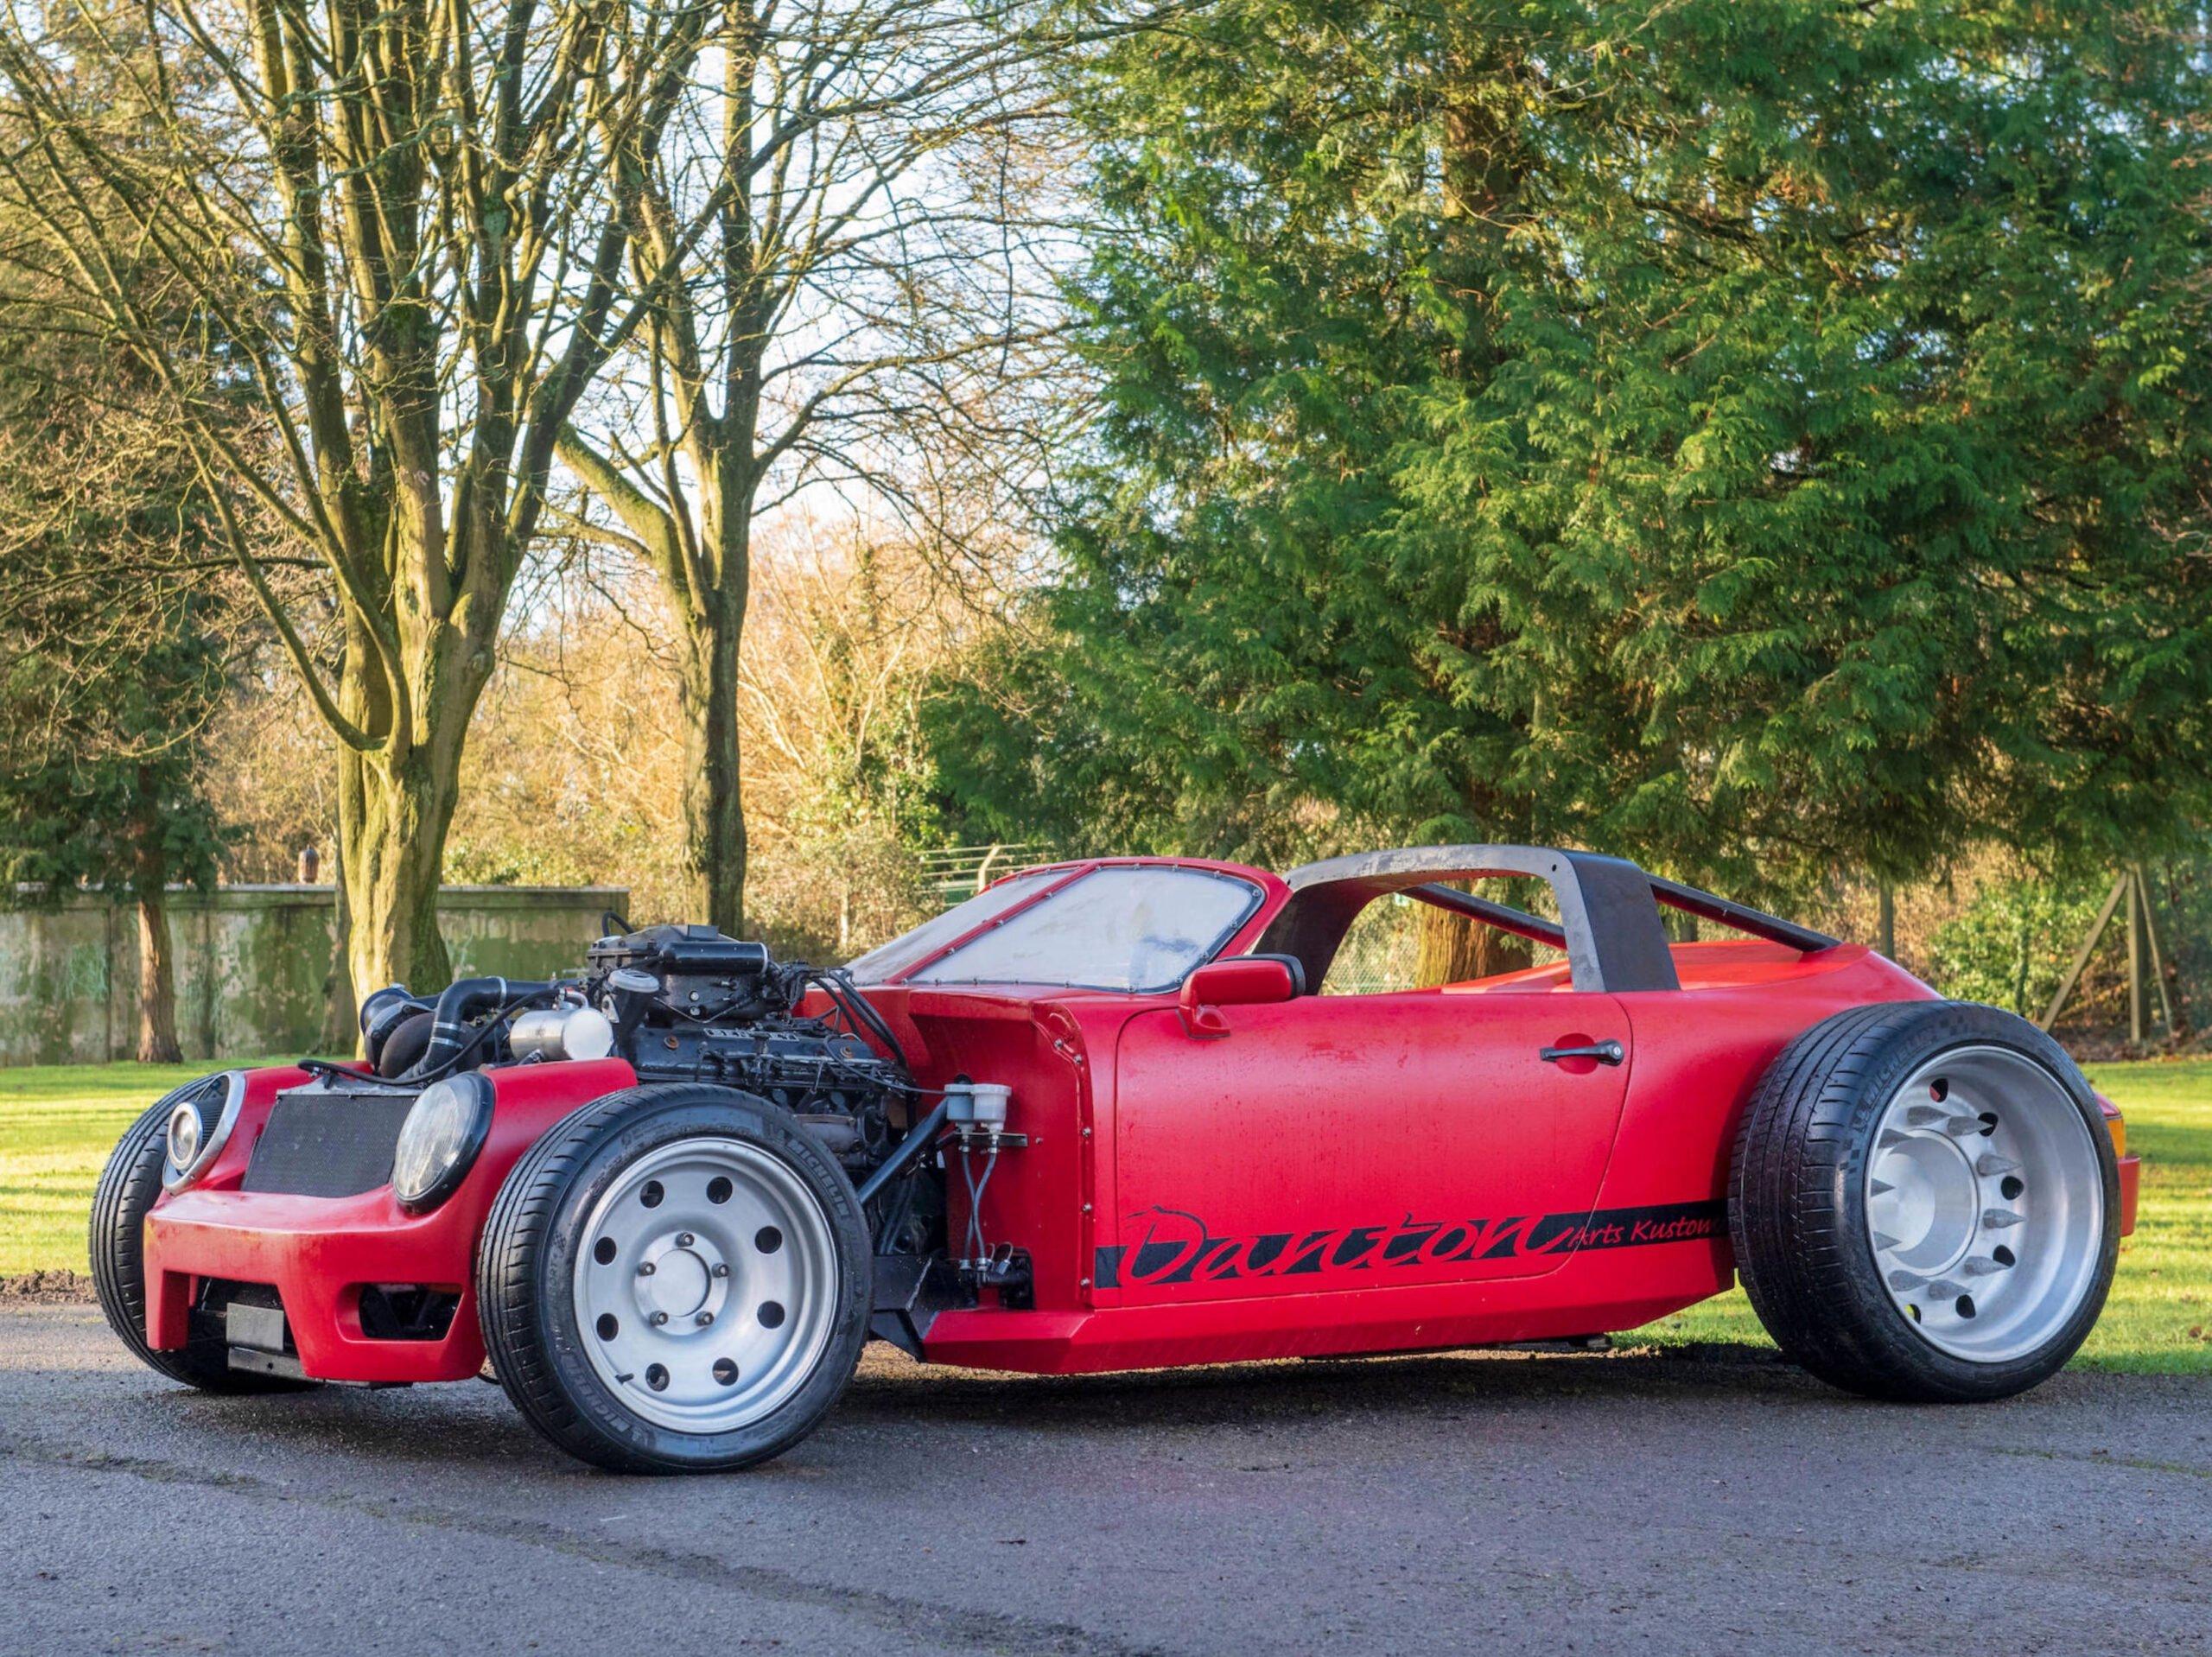 Porsche 911 Bentley V8 Turbo Hot Rod Alexandre Danton